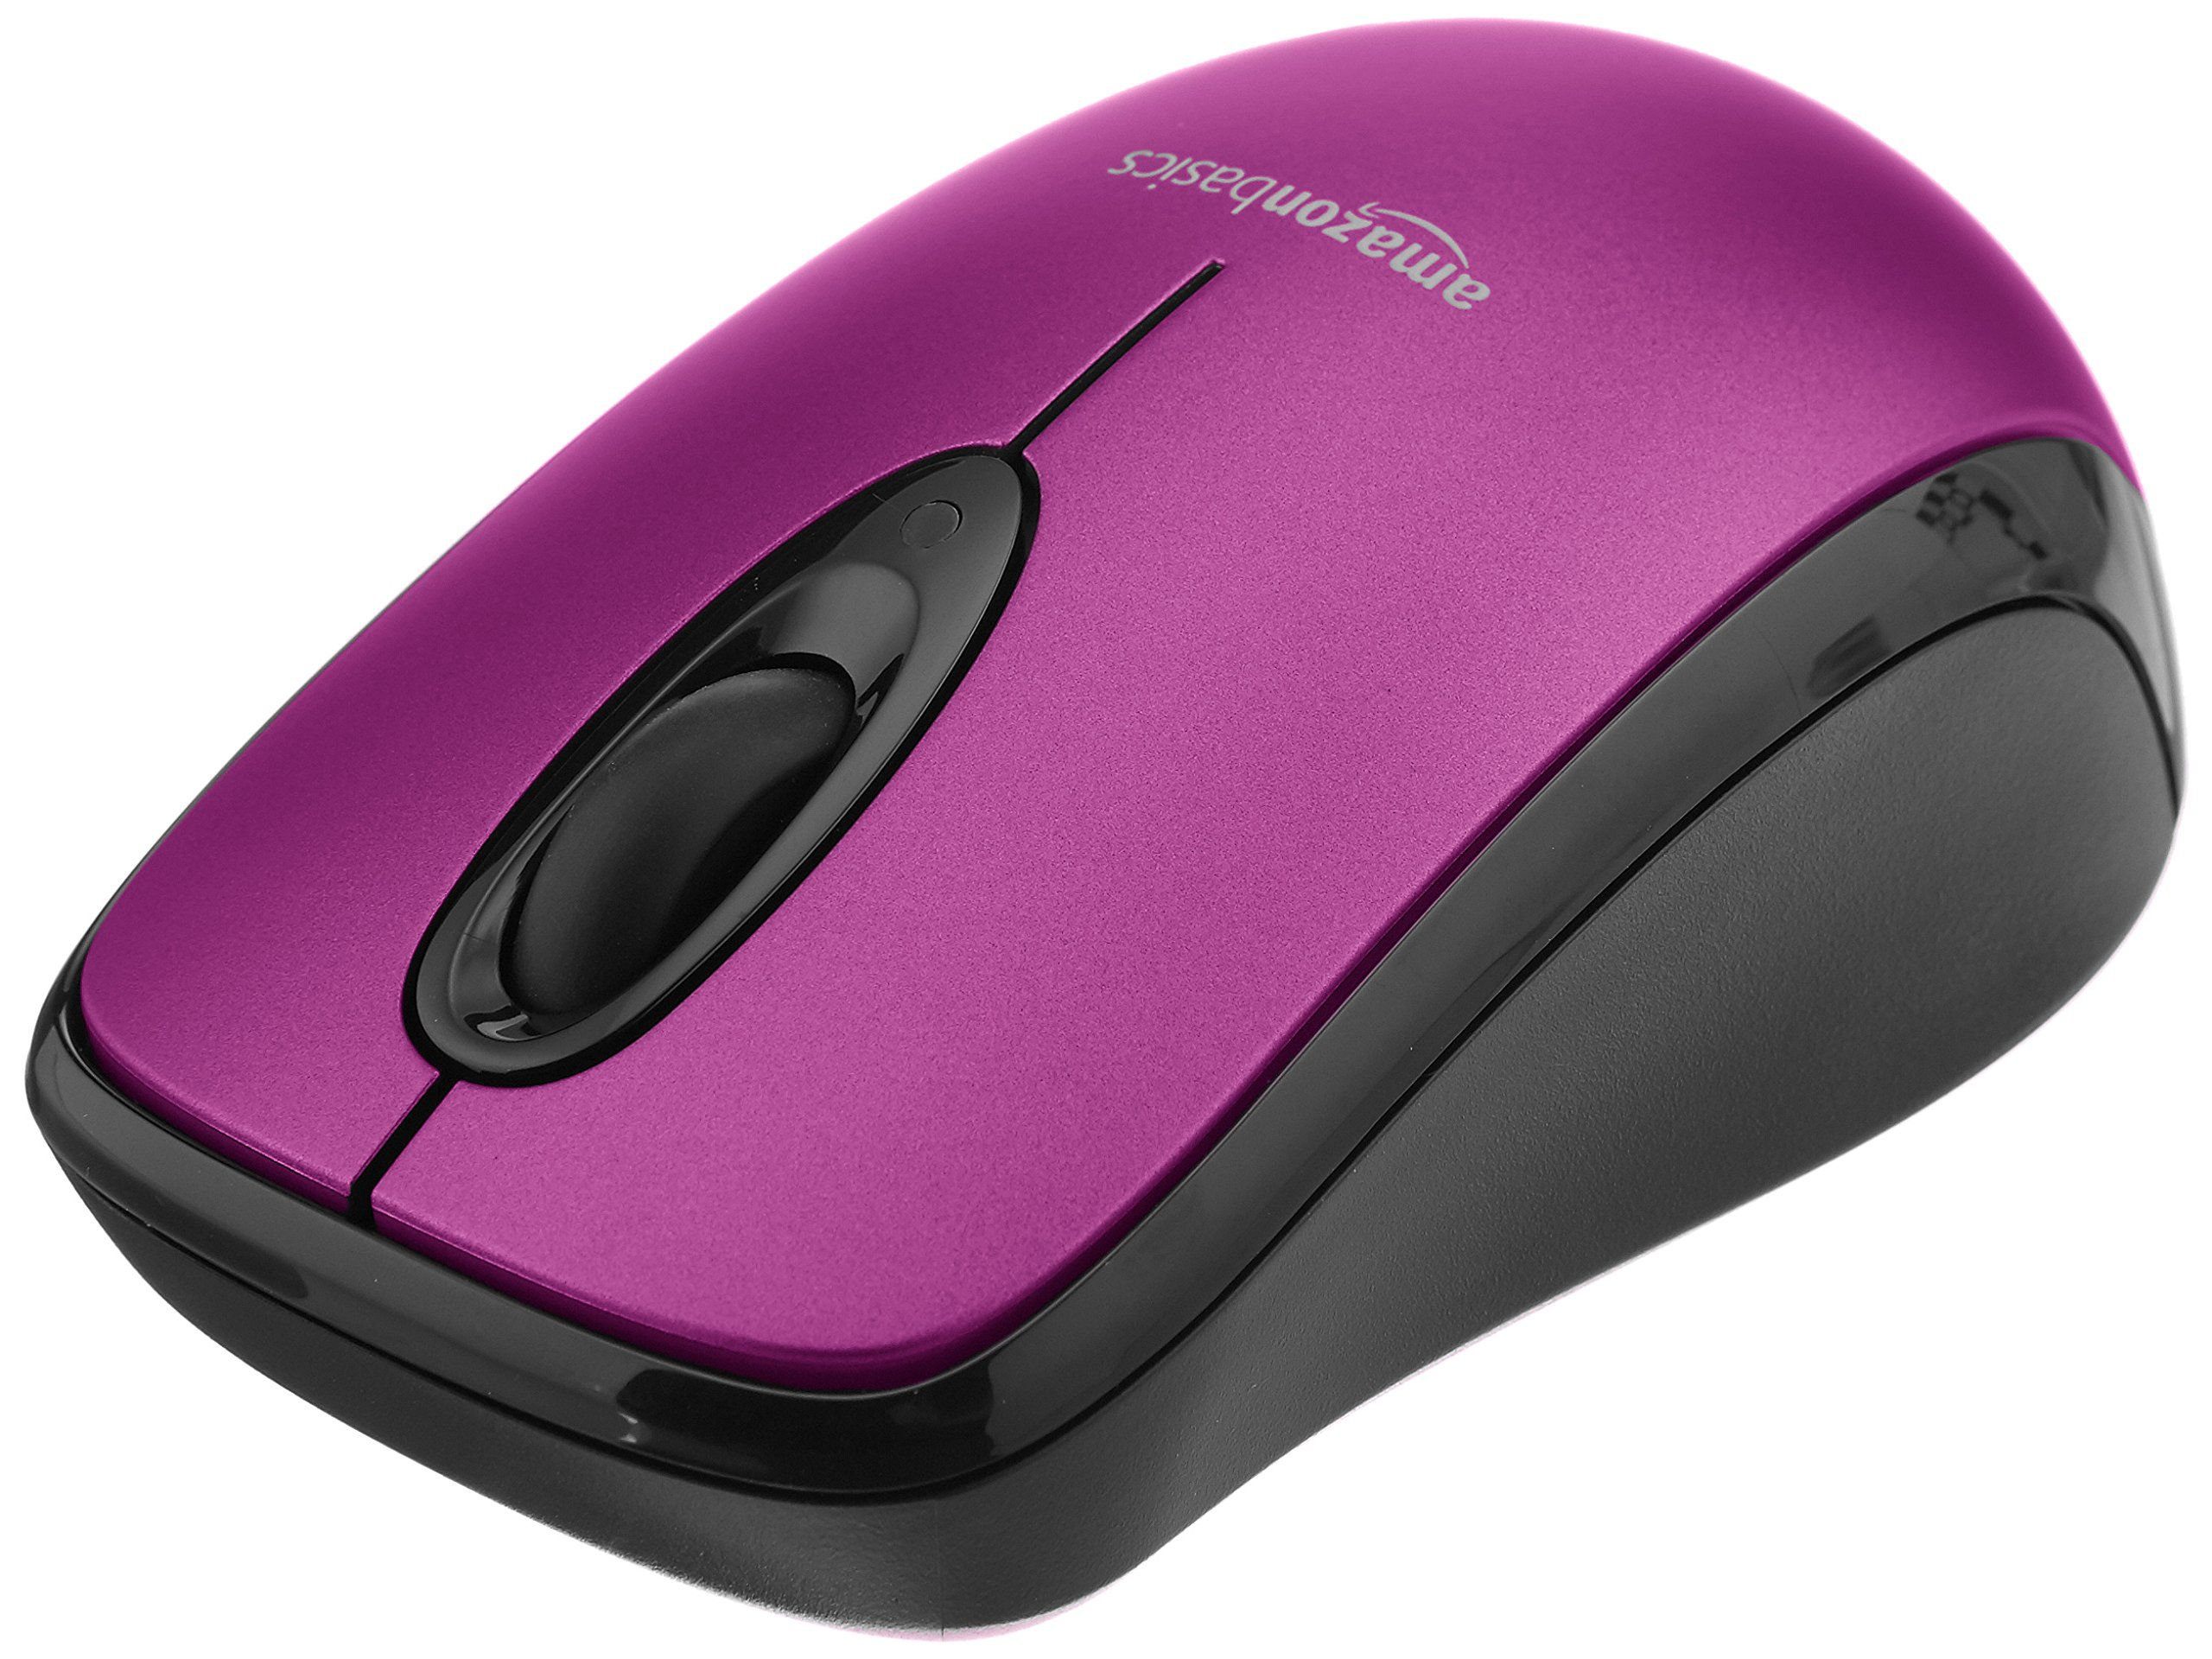 dab21537f55 AmazonBasics Wireless Mouse with Nano Receiver - Purple,#Mouse, #Wireless, # AmazonBasics, #Purple